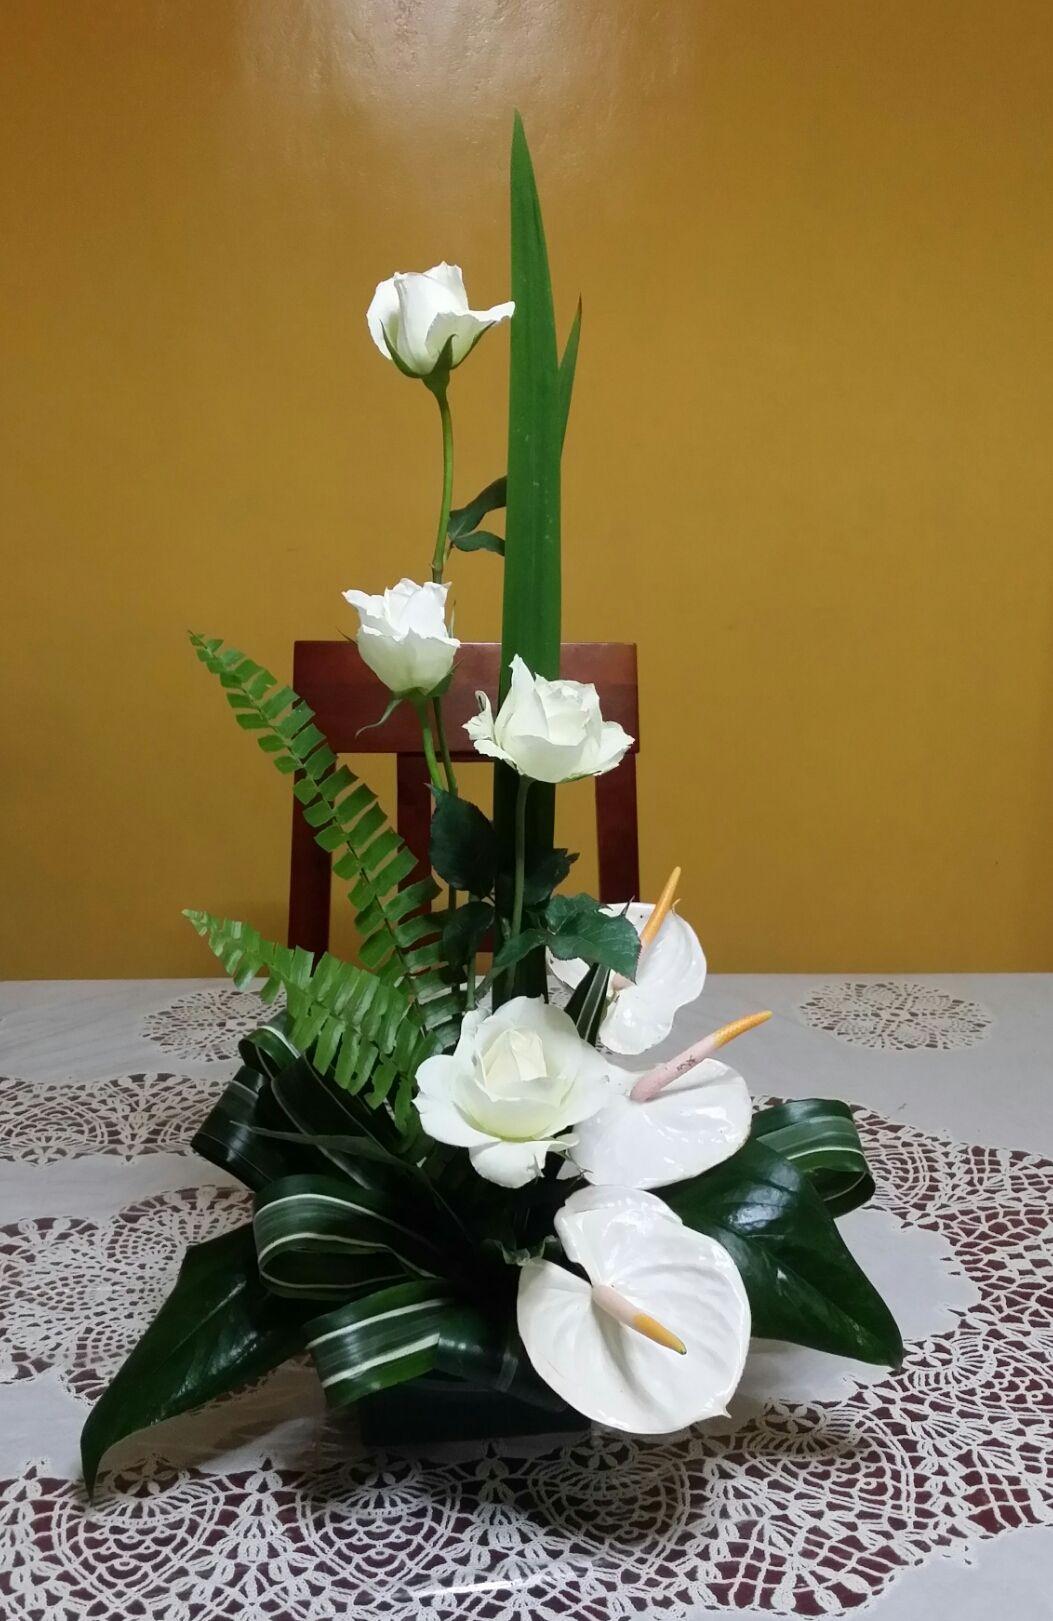 Elegance White Roses Flower Arrangements White Anthurium My Arrangement Of R Flower Arrangements Simple Church Flower Arrangements Large Flower Arrangements